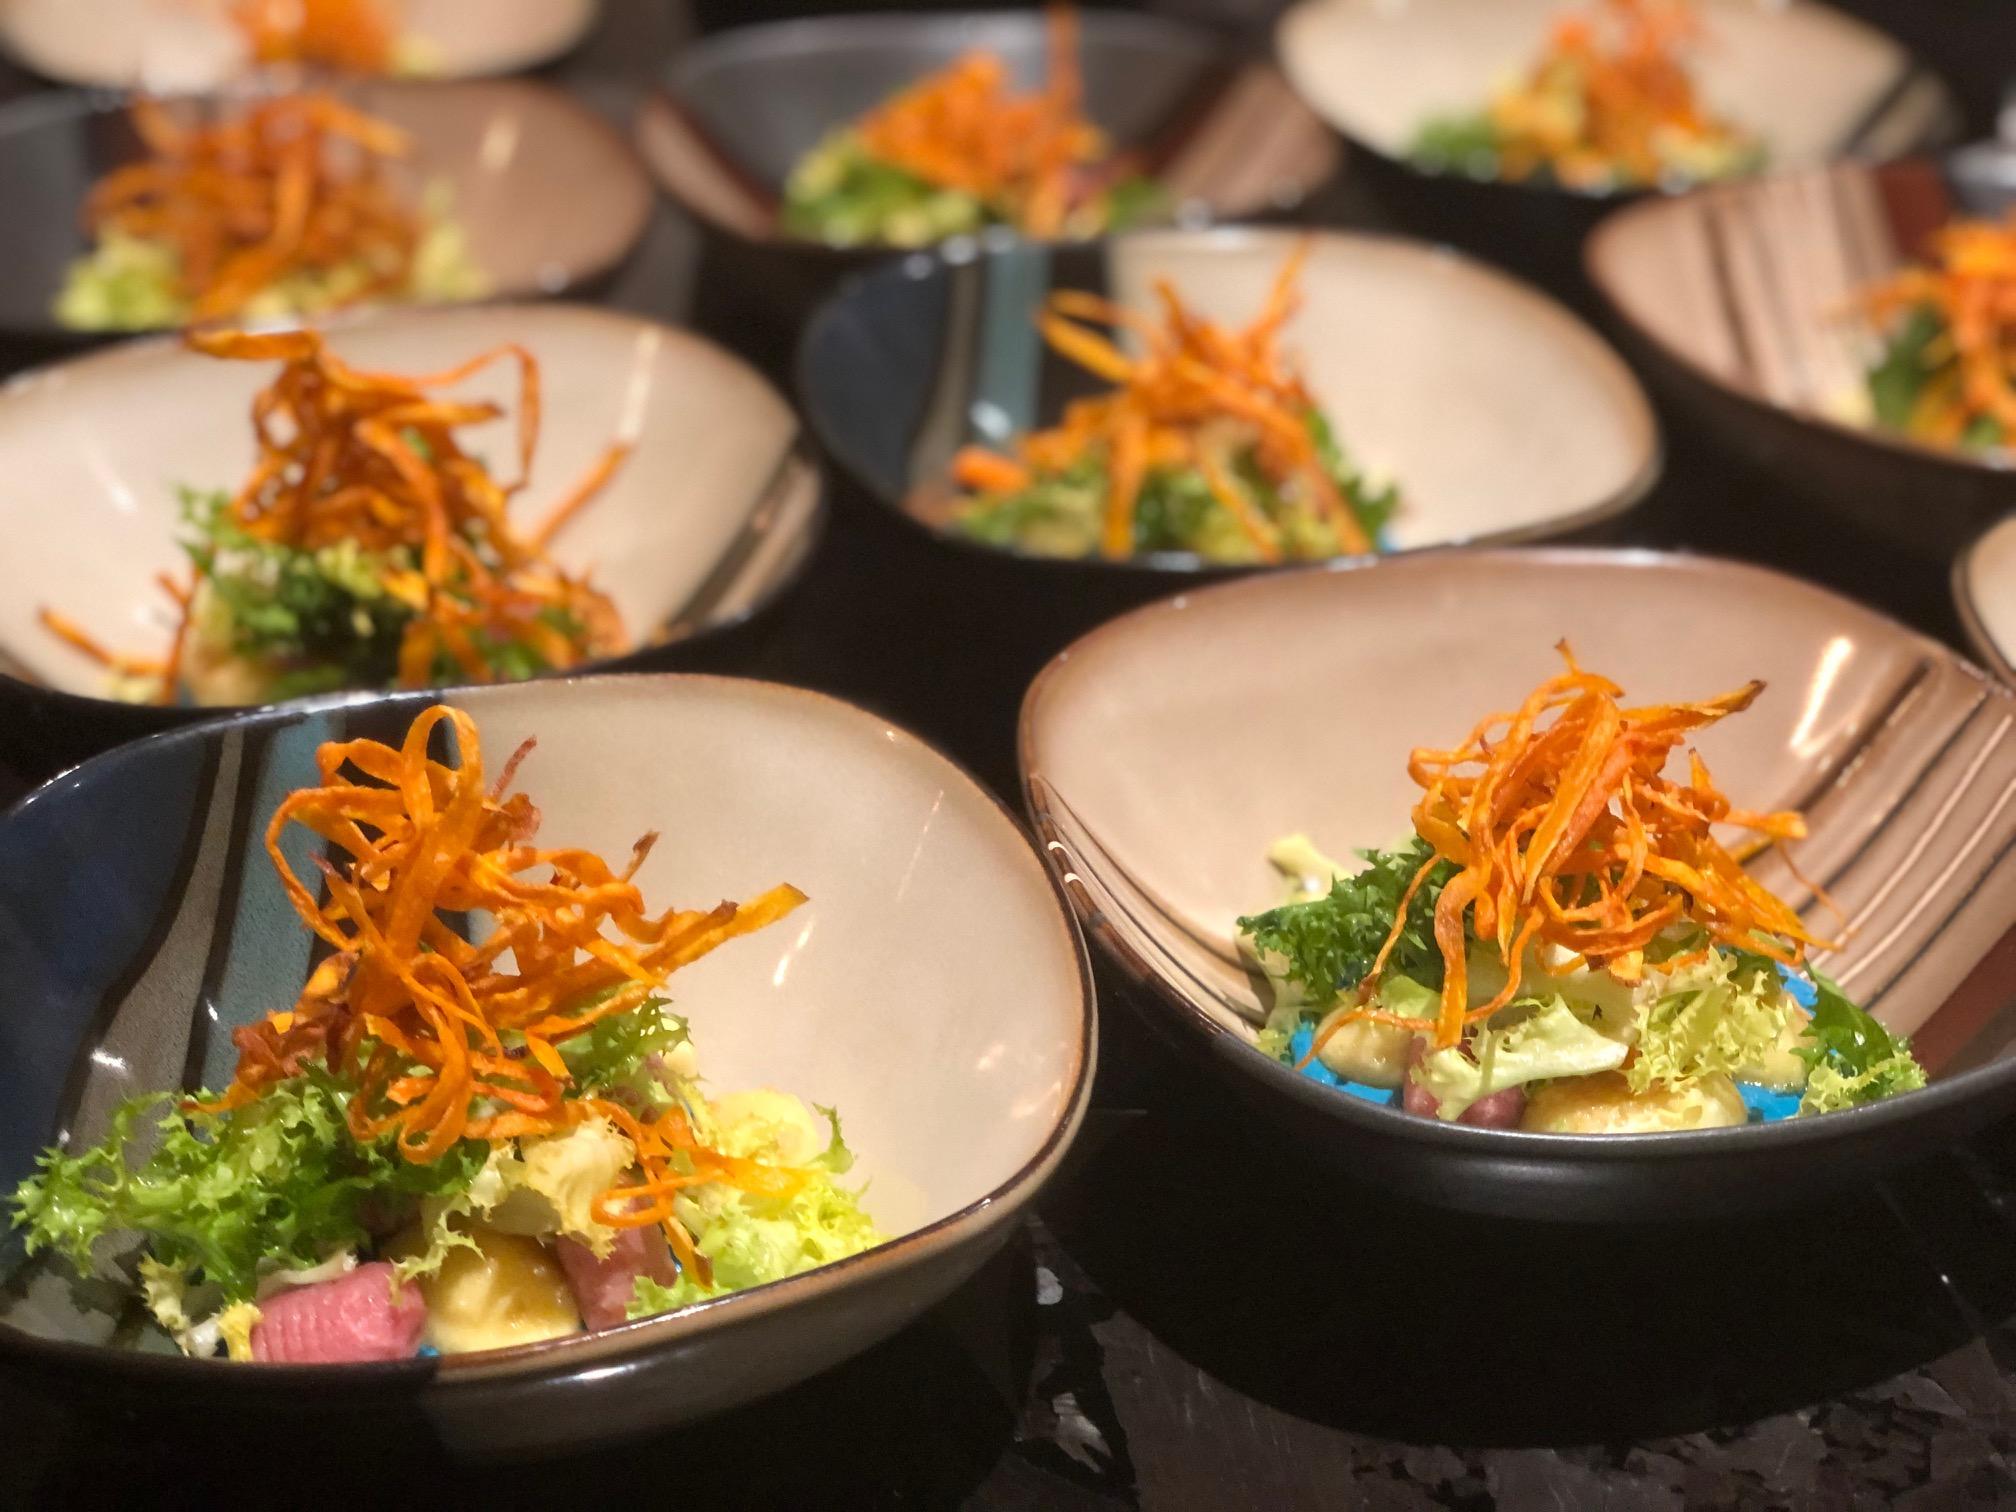 Pan seared potato gnocchi - Catering Service in Mississauga